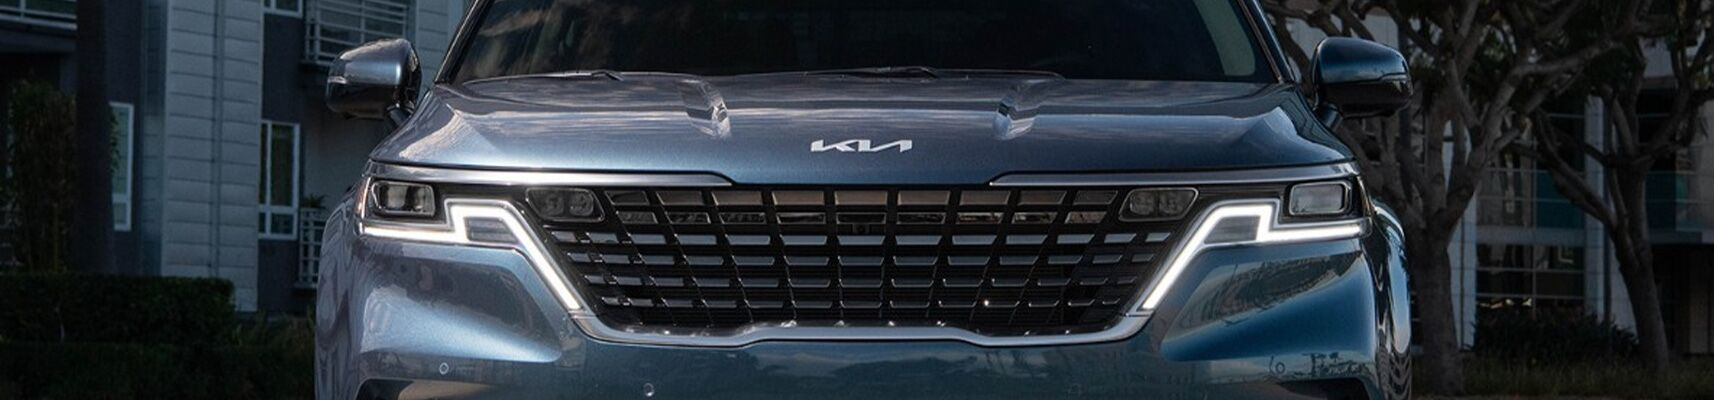 Kia Service Specials in Moosic, PA